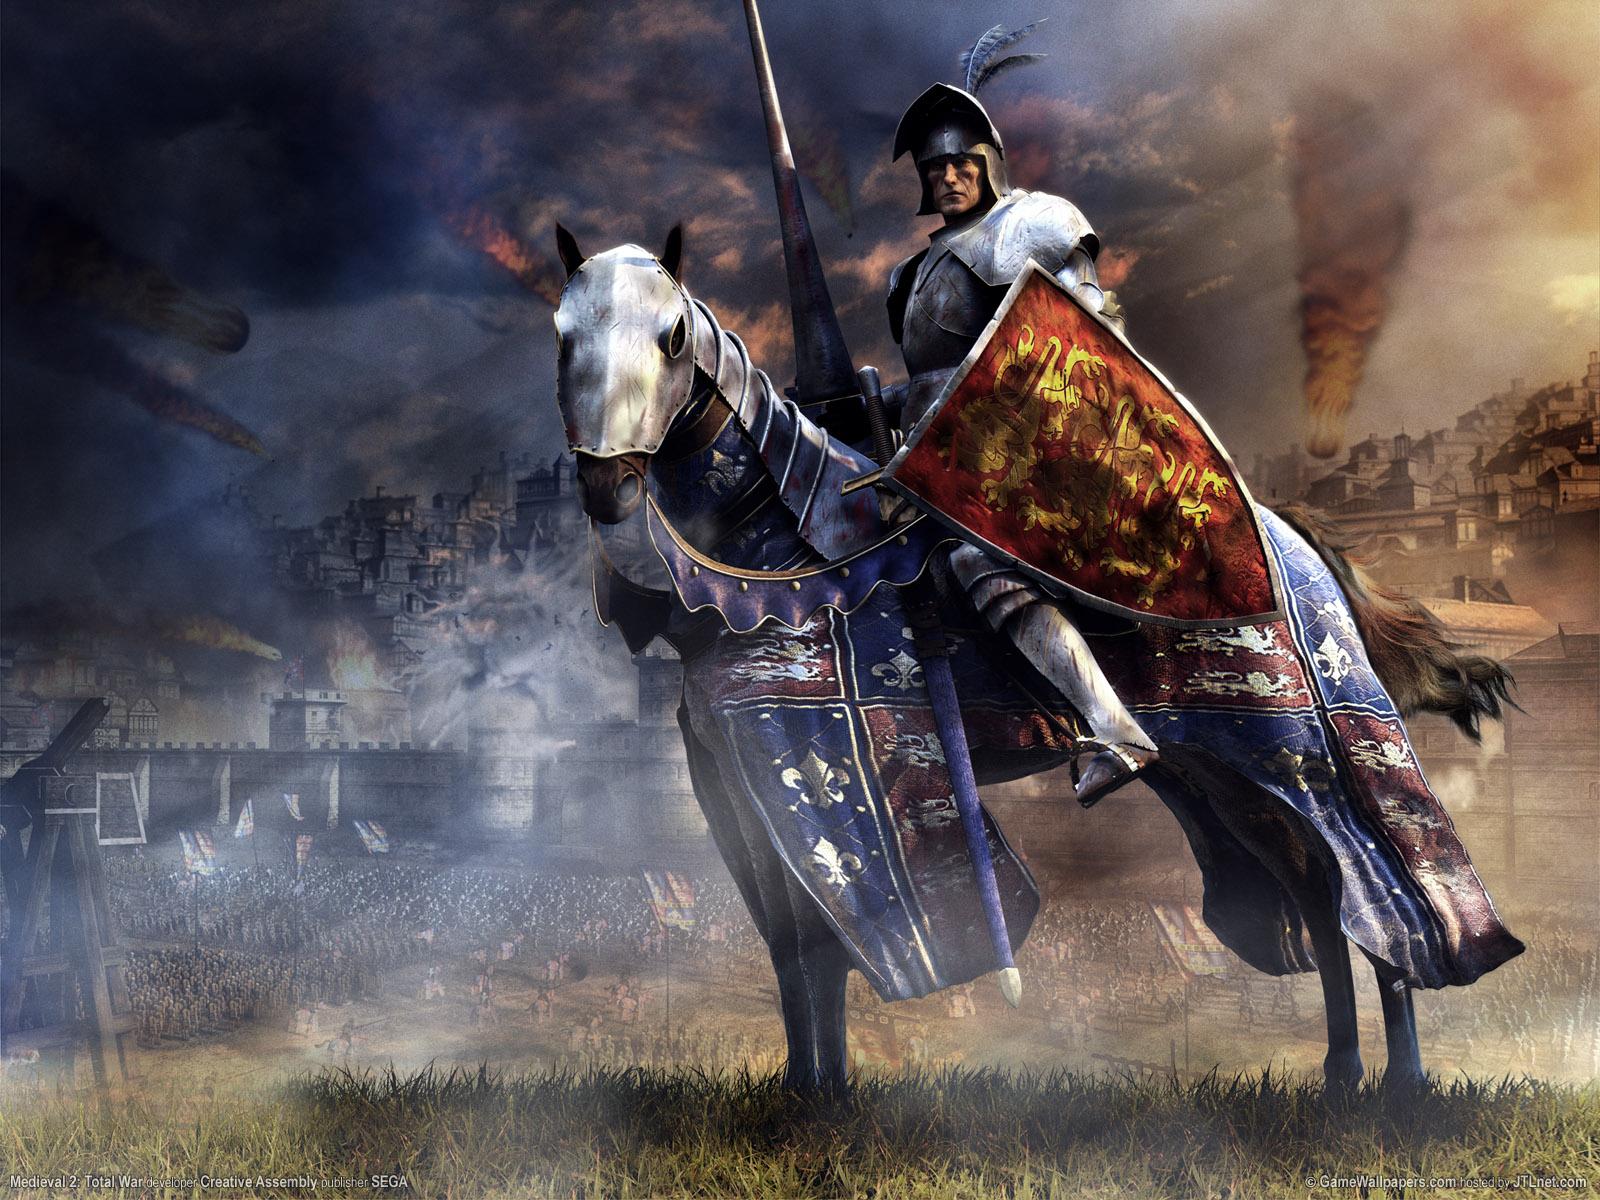 1600x1200 Medieval 2 Total War desktop PC and Mac wallpaper 1600x1200